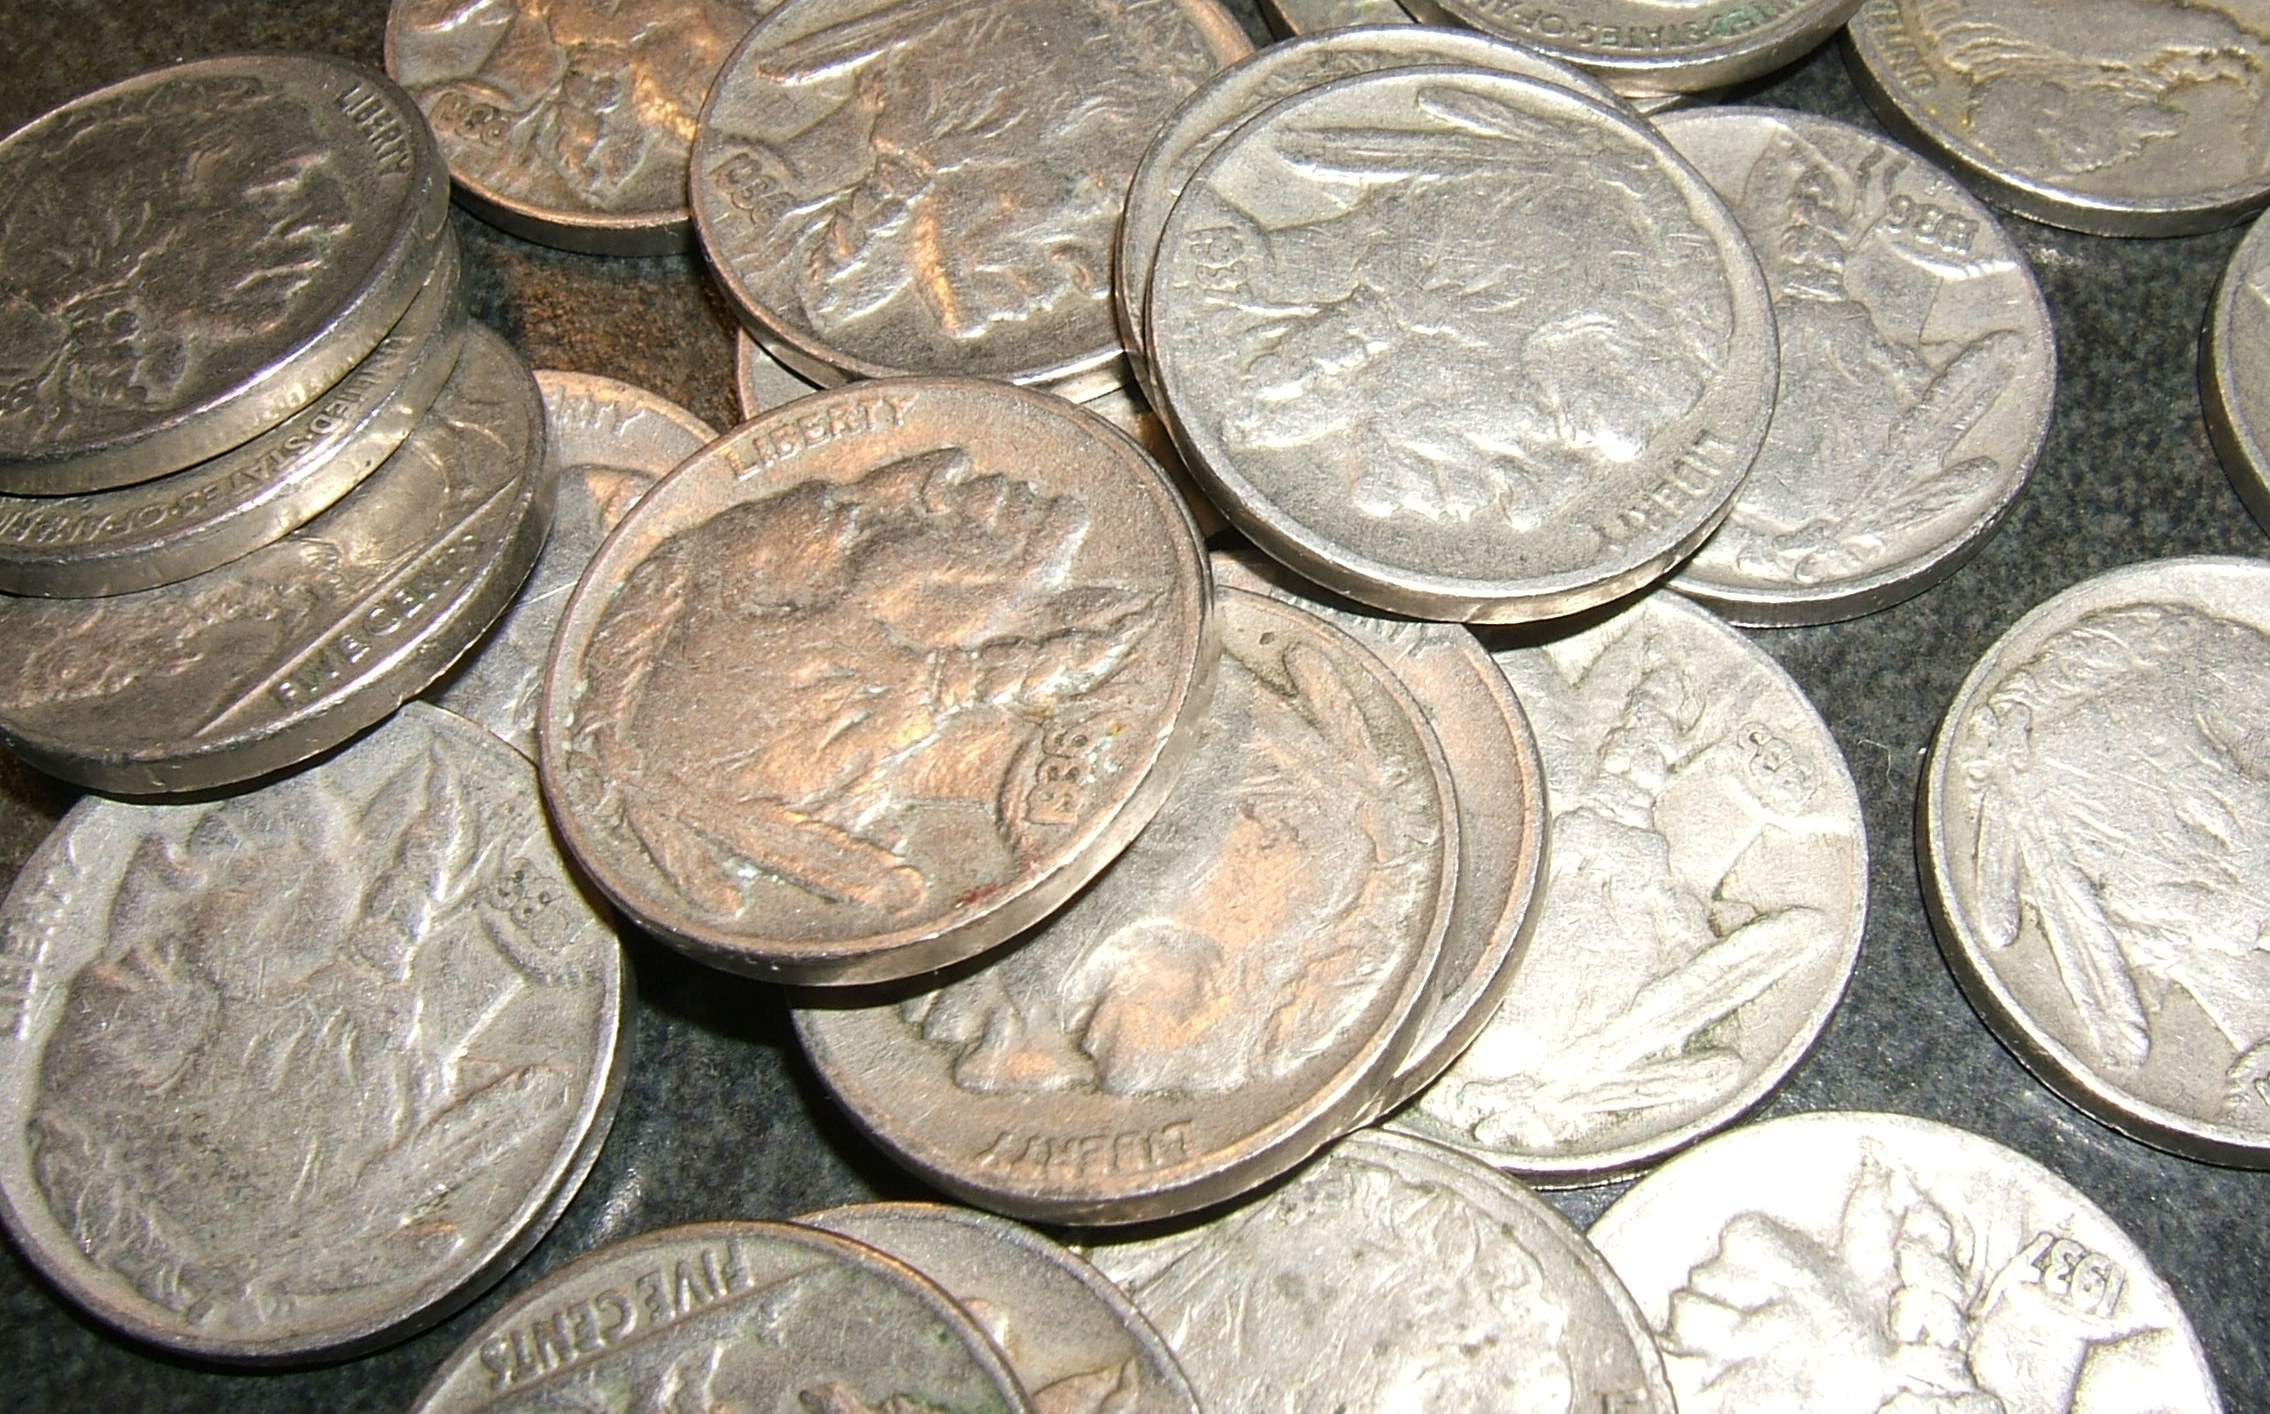 Nickel Legislation Change